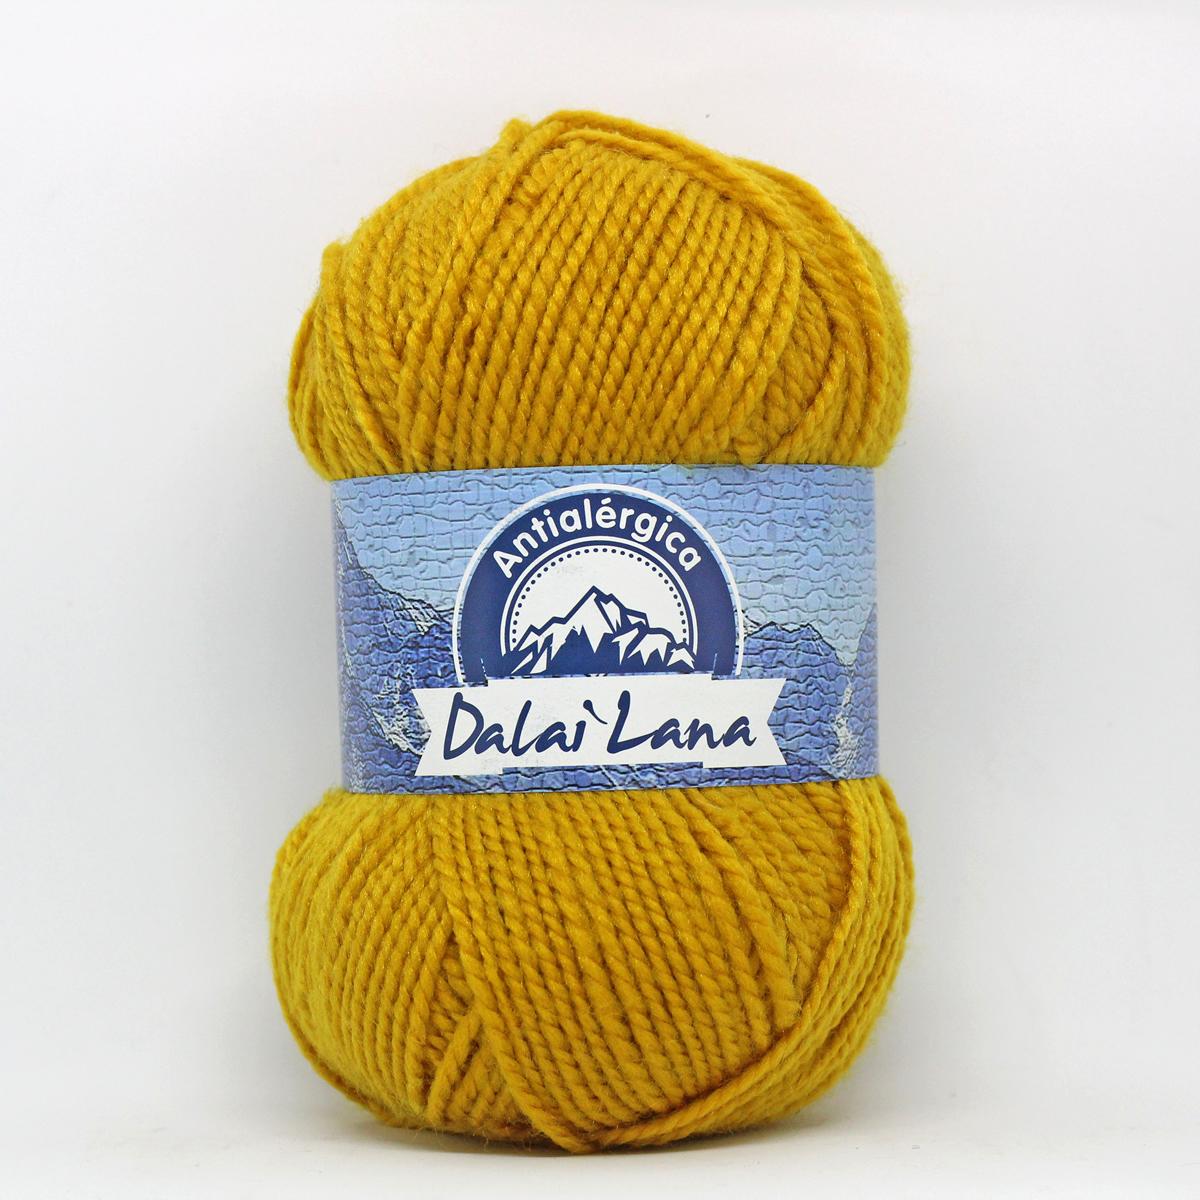 Dalai Lana - 762